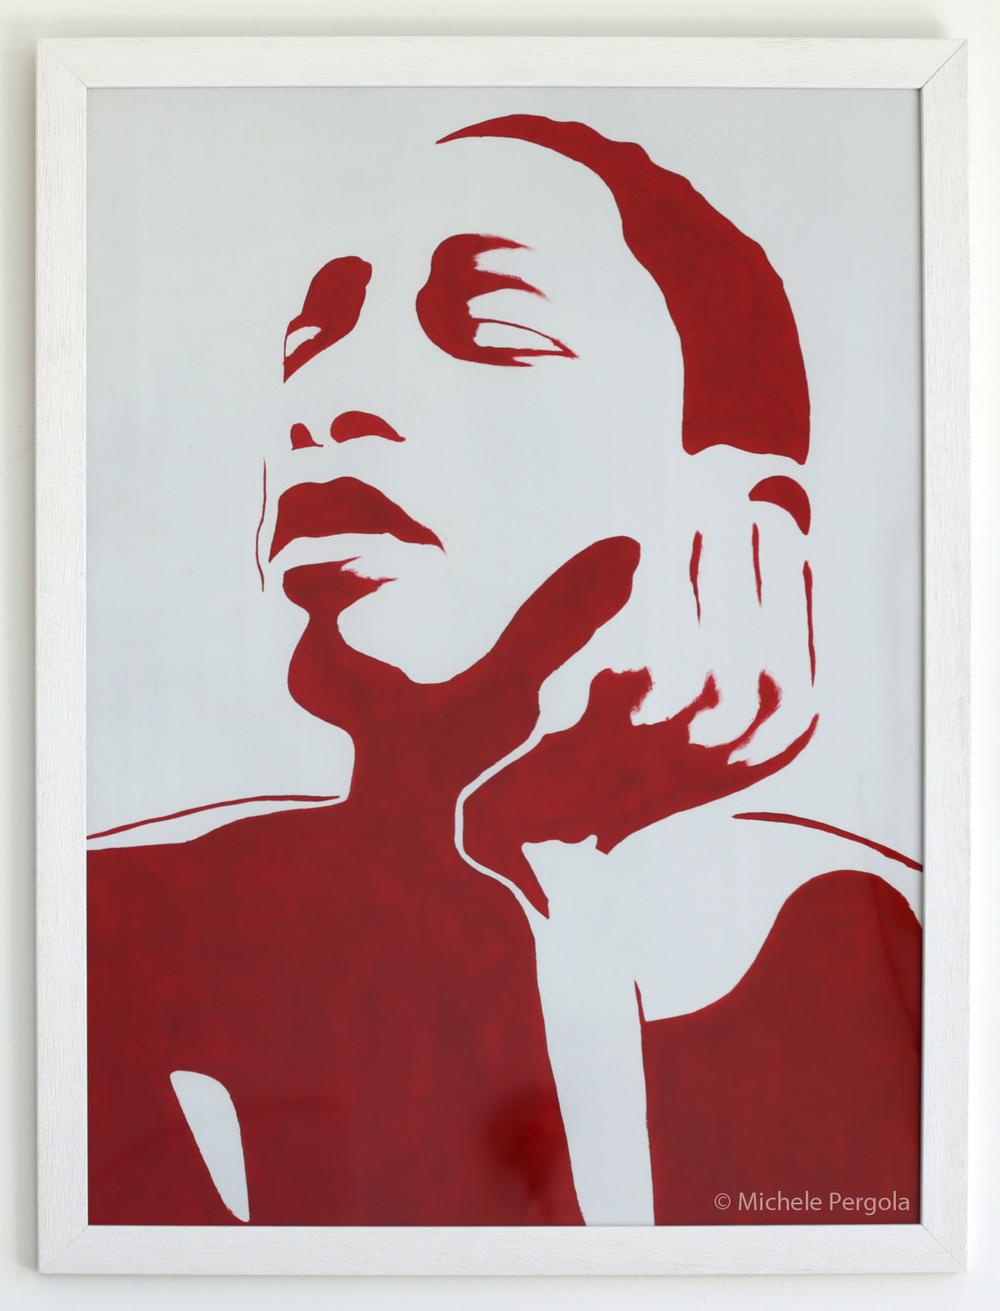 Ricky Vaughn, 2014 (Acrylic on cardboard, 24x31 inches)